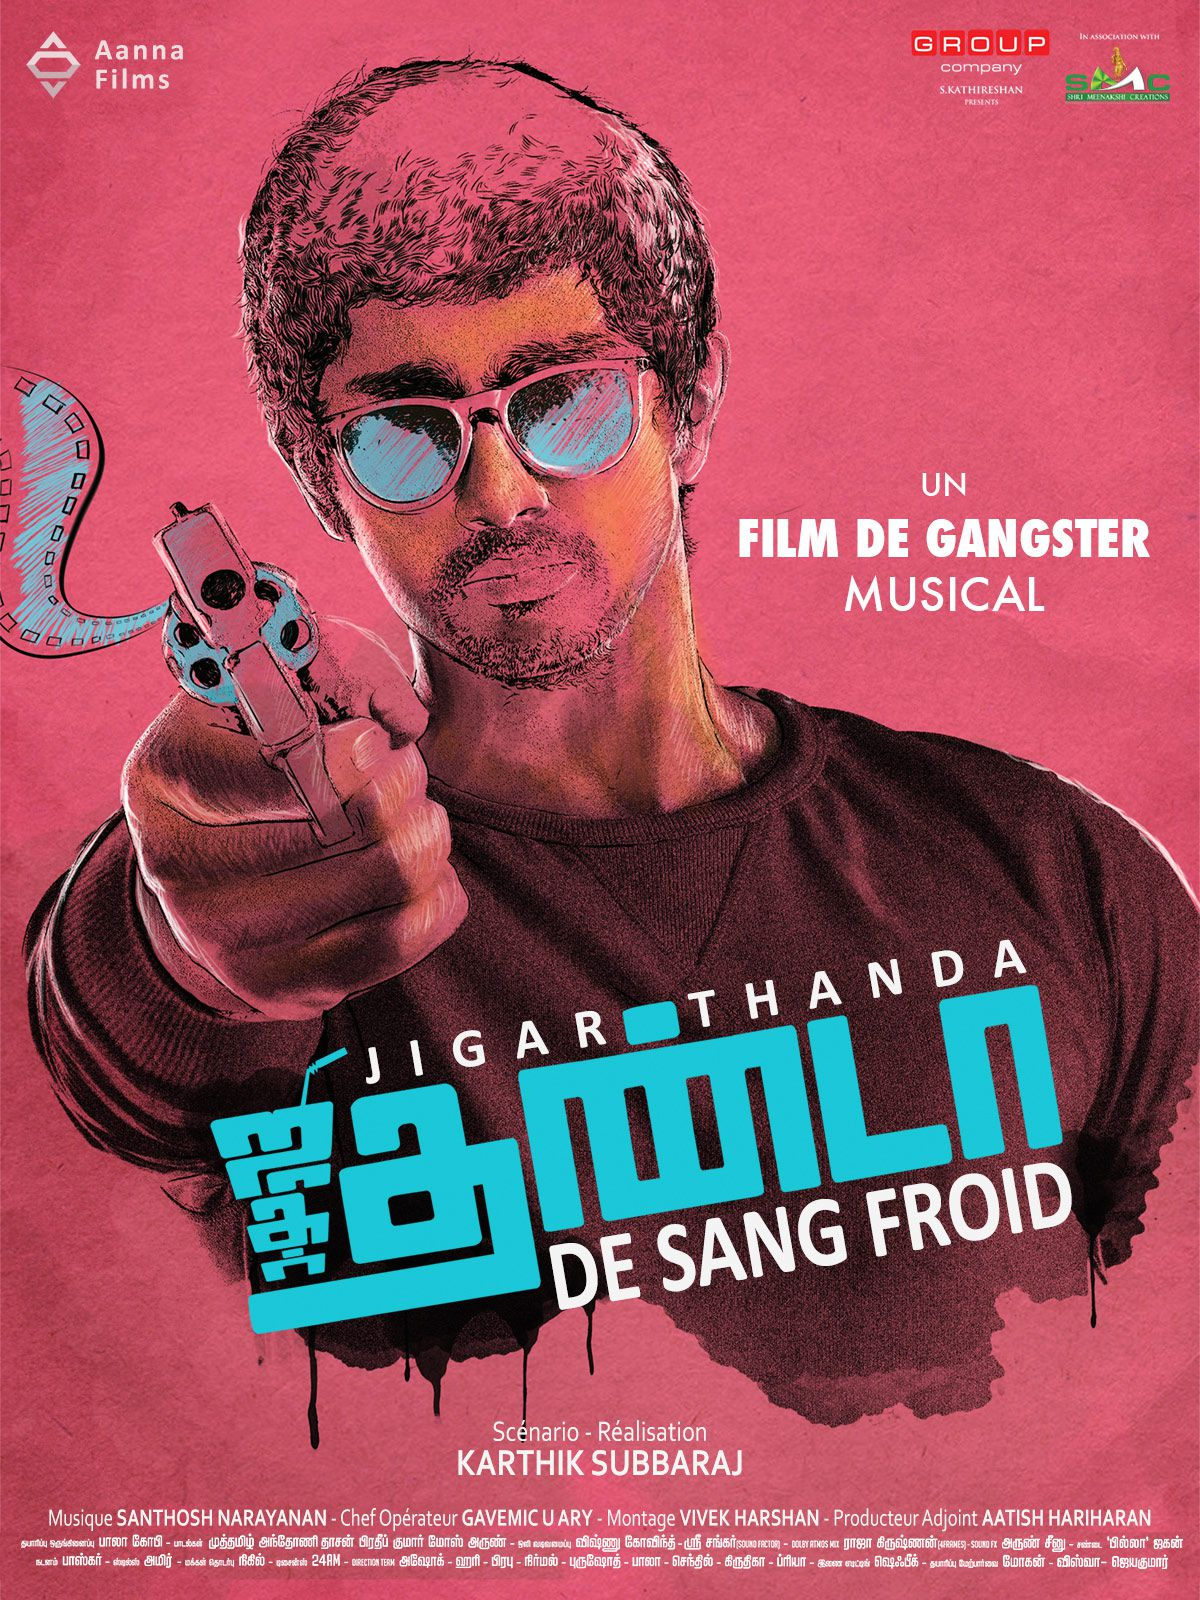 Jigarthanda - De Sang Froid - Film (2014)